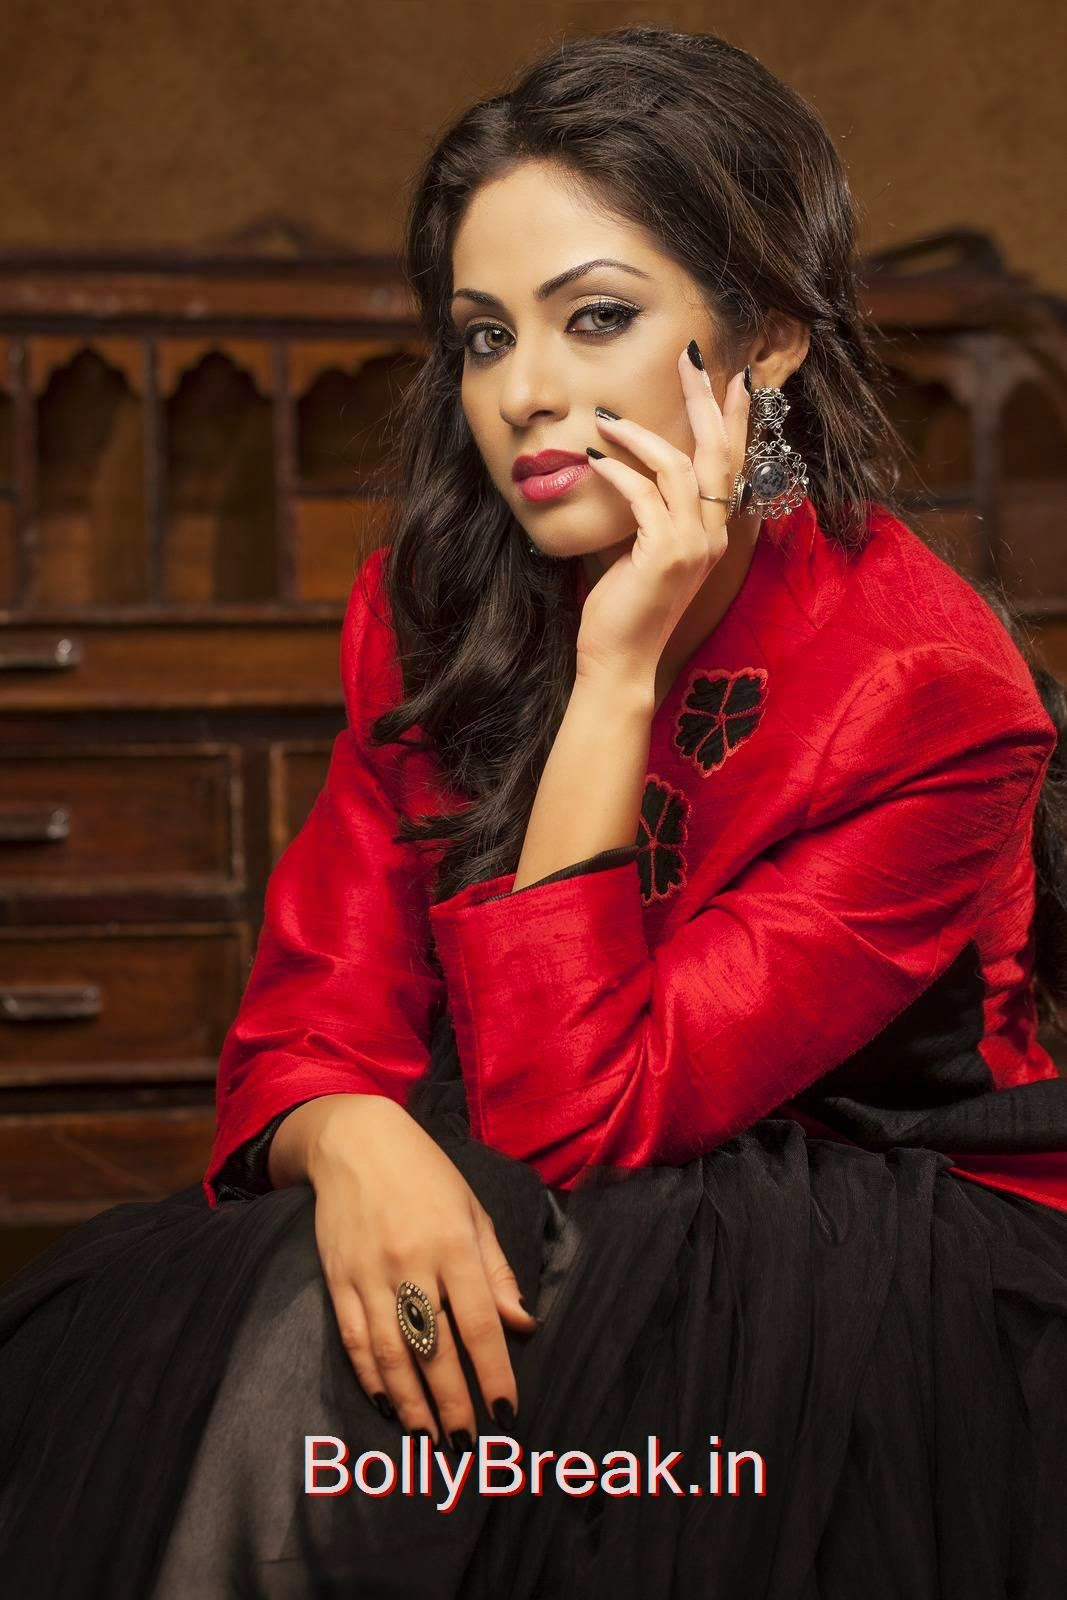 Telugu Actress Sada, Hot HD Images Of Sada In Red & Black Dress